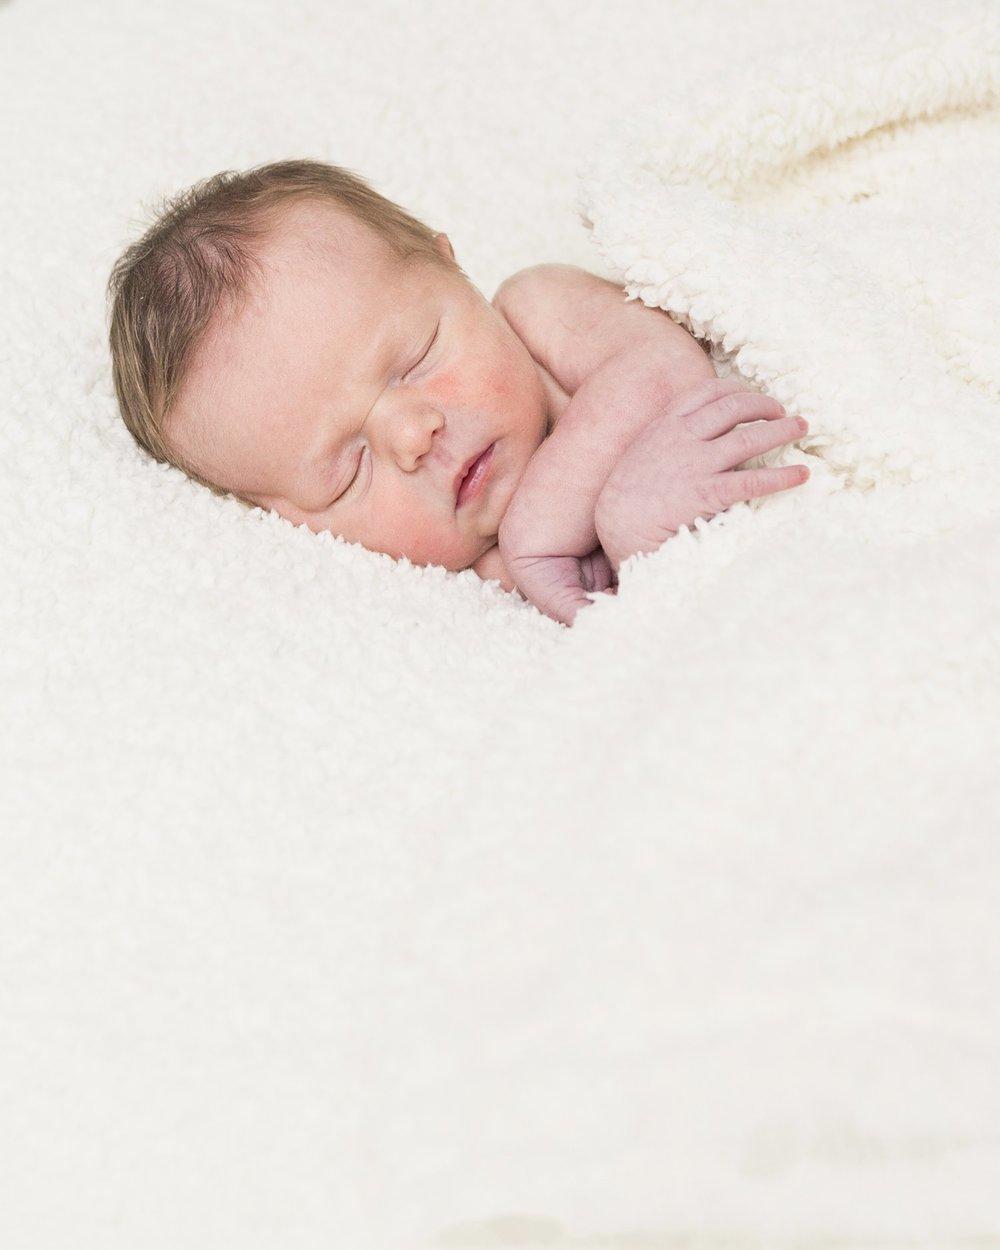 zanzo_portraits_hobart_photographer_tasmania_family_baby__0048.jpg